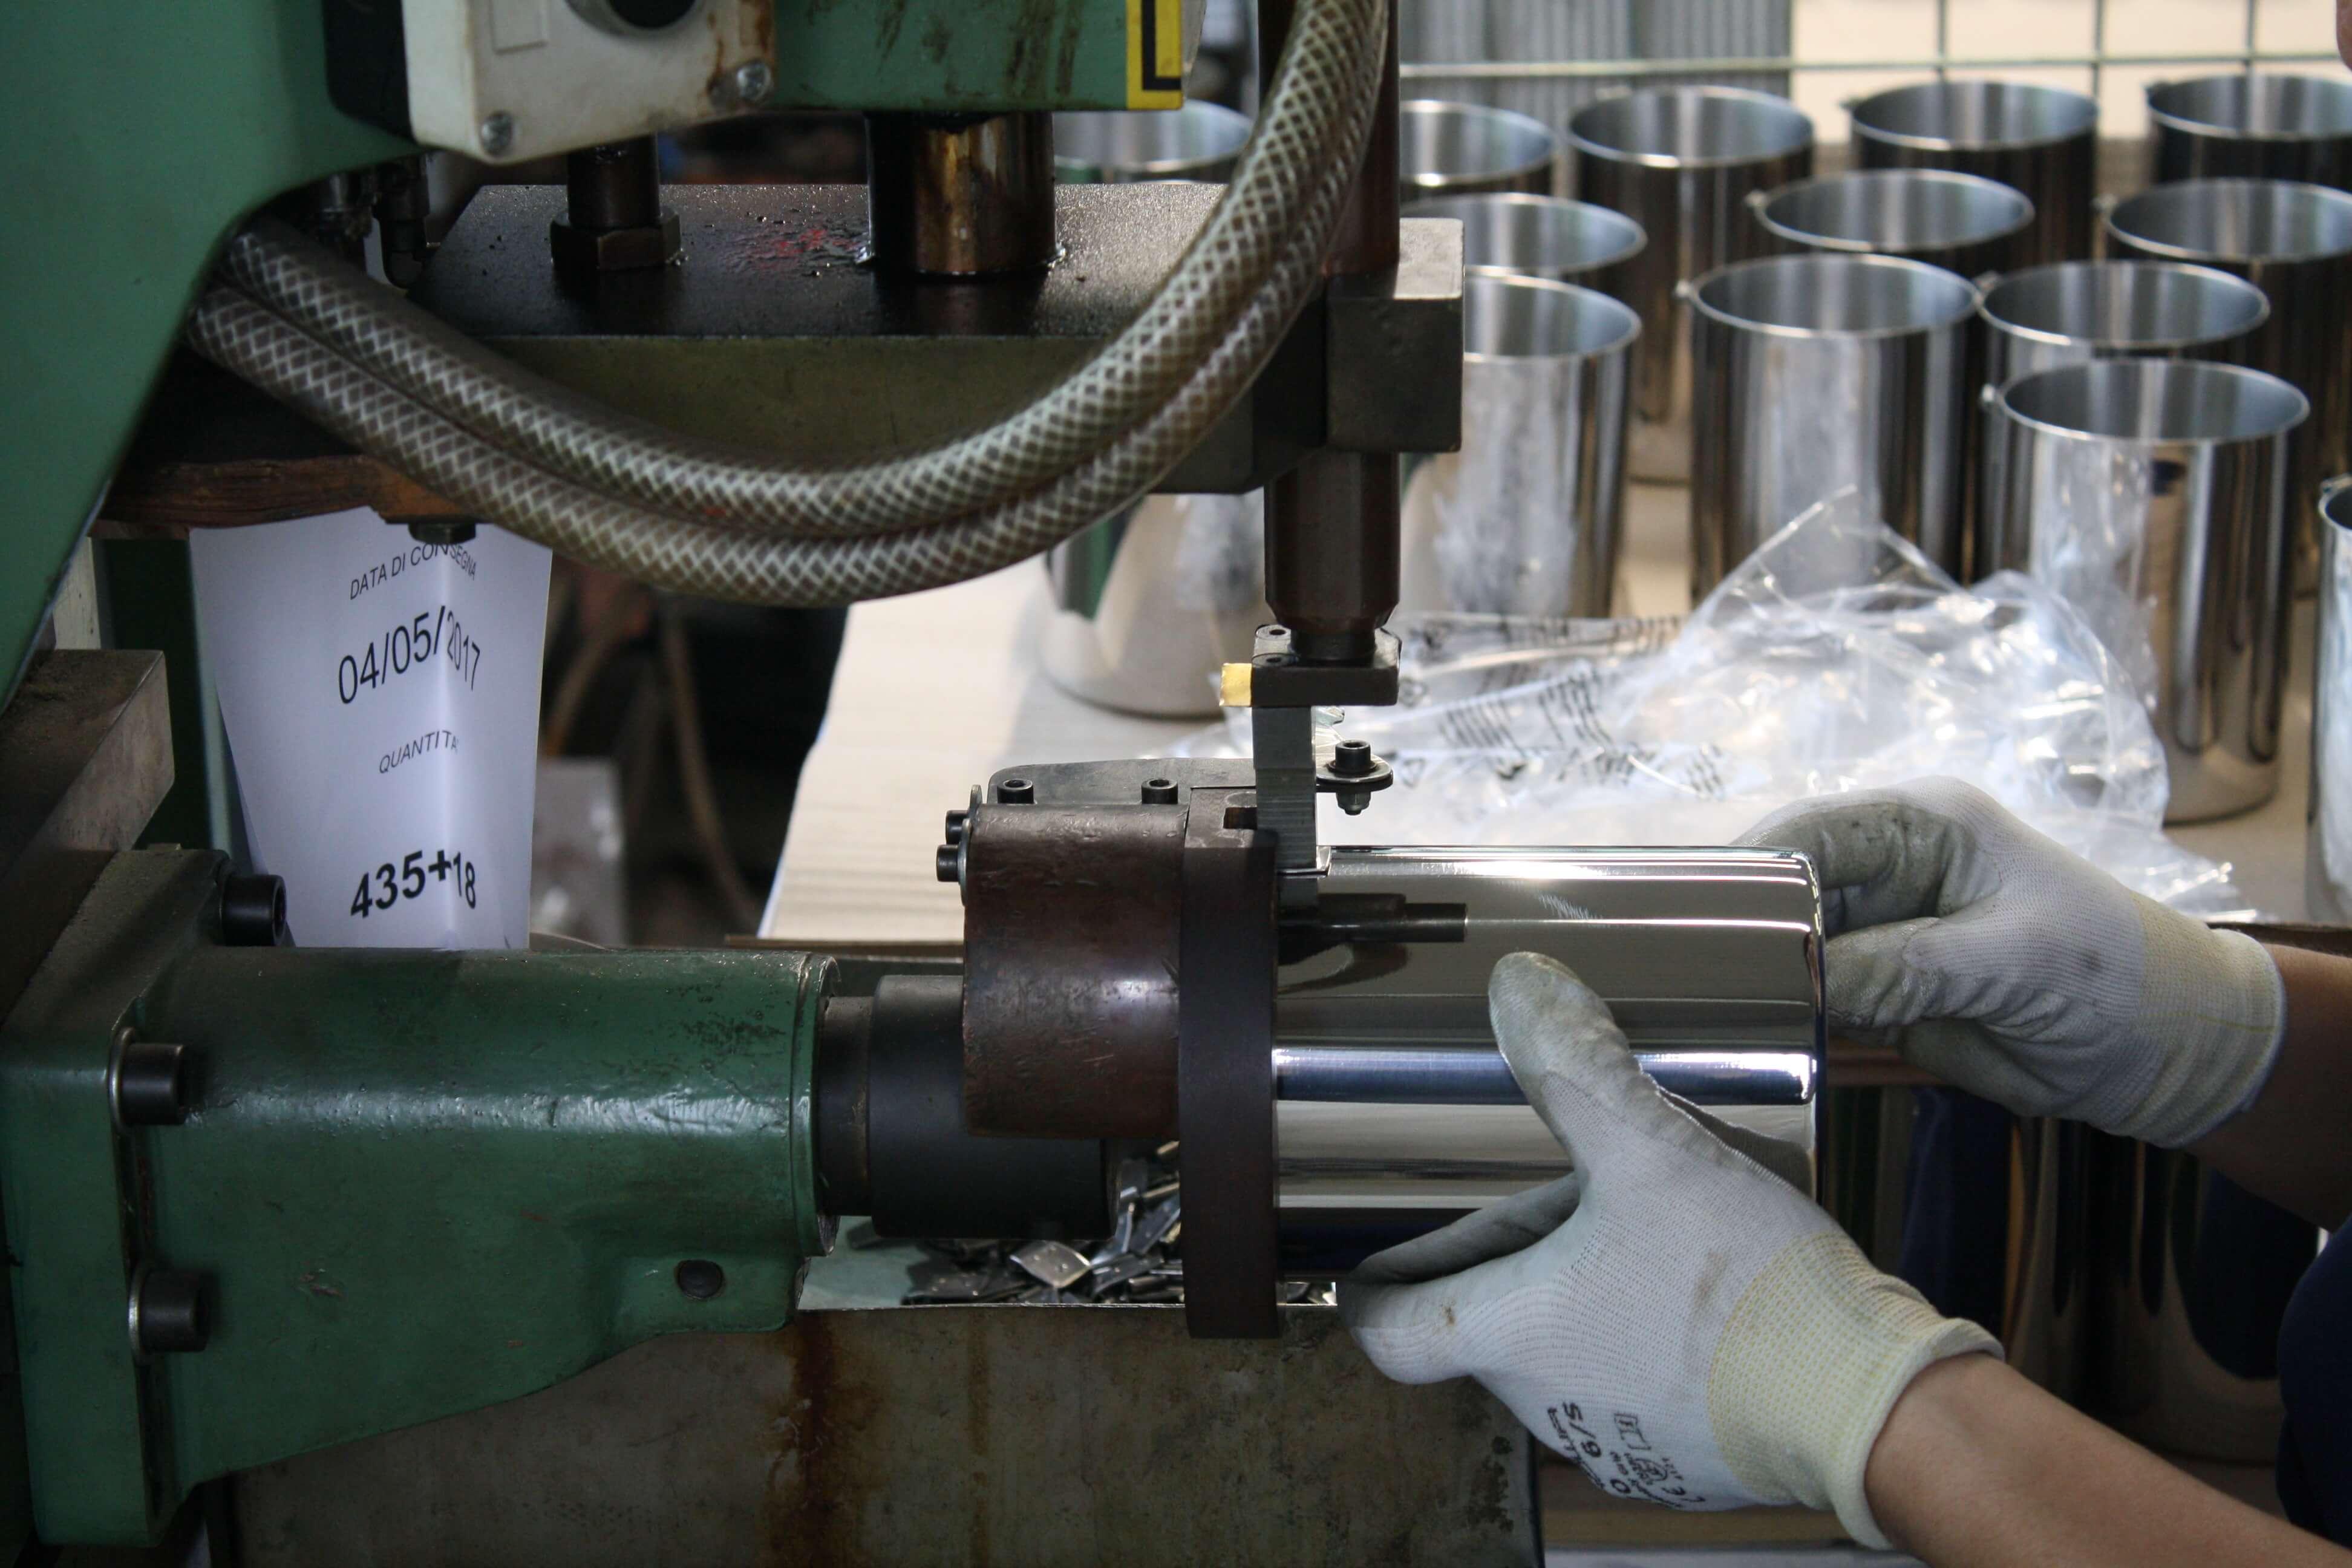 Motta-Handarbeit-Barista-Tools